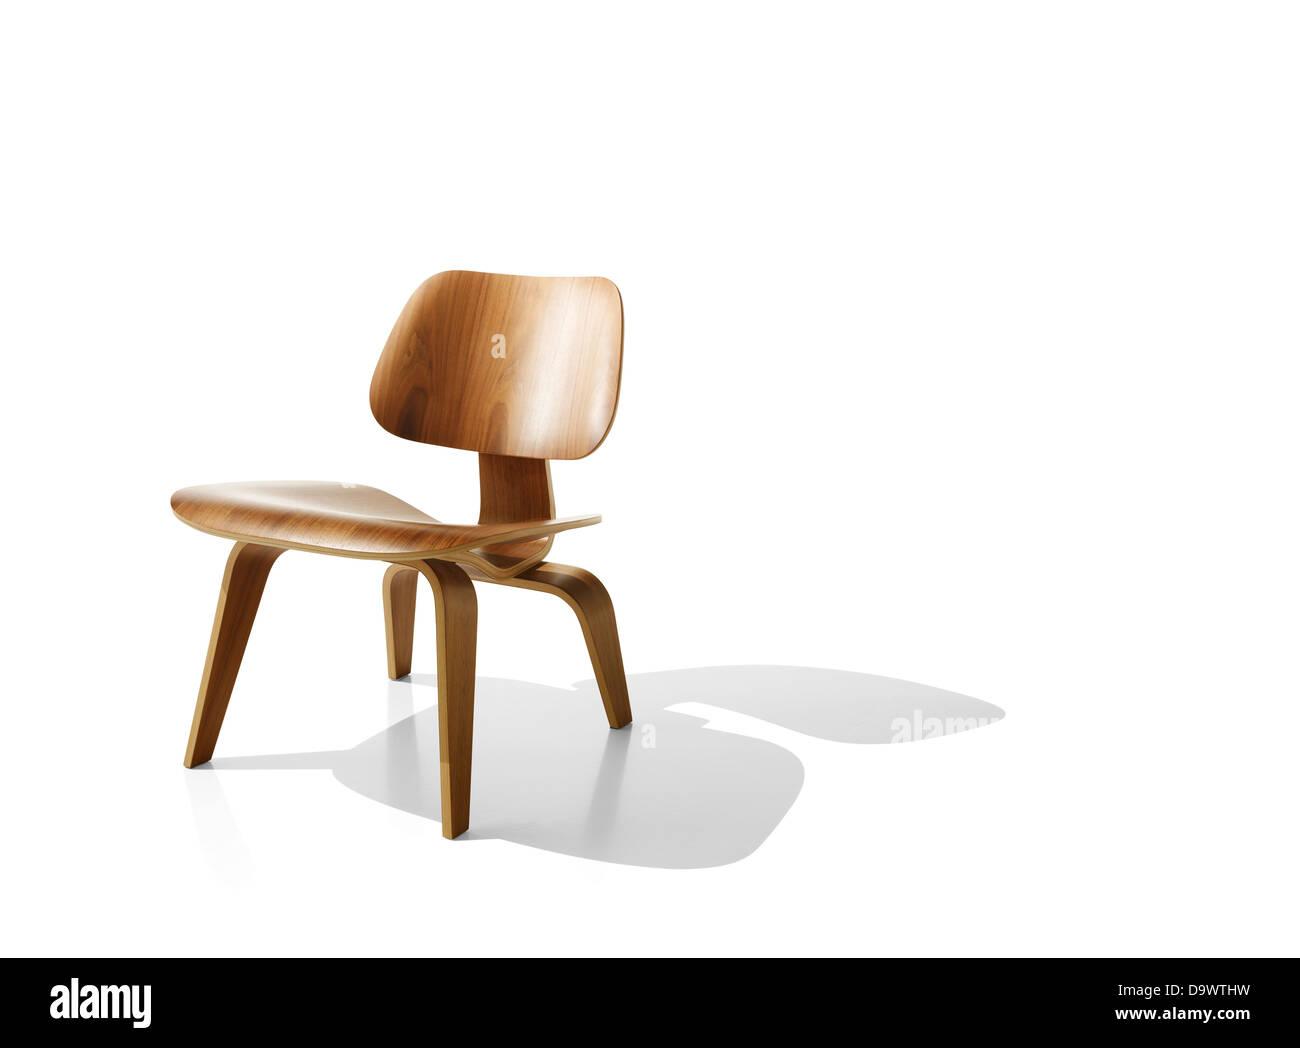 Stuhl auf weiß Stockbild